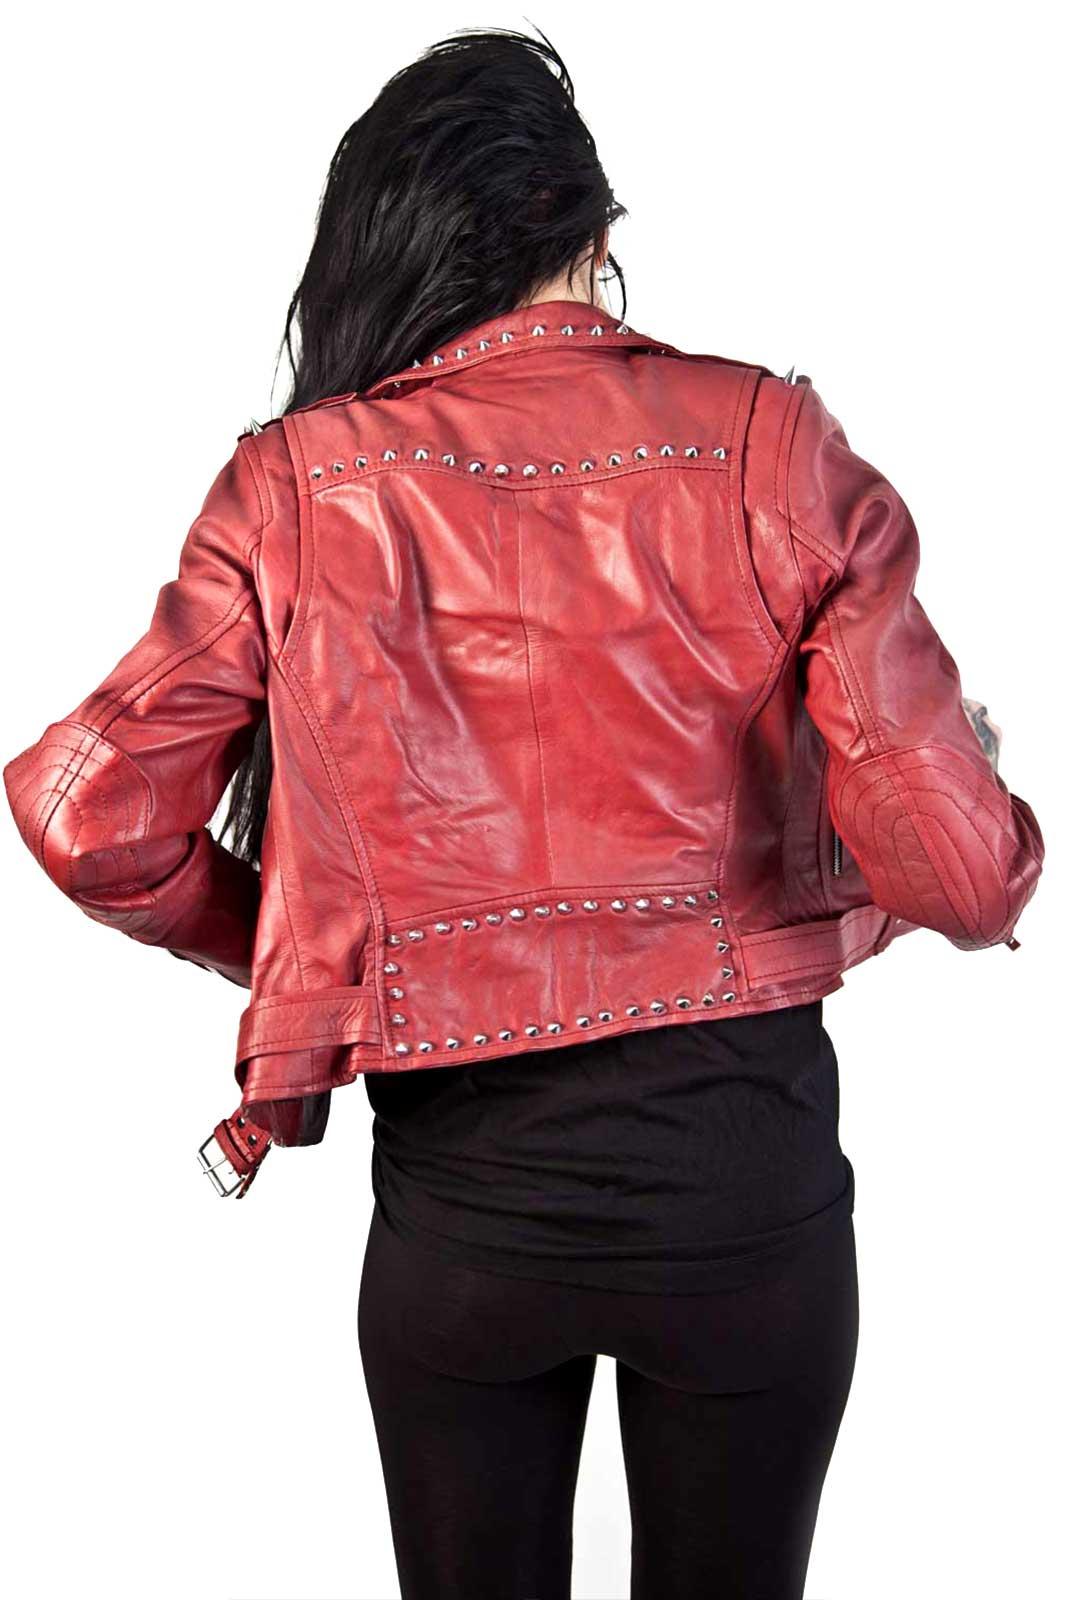 Roll Rivets Leather Jacket Back